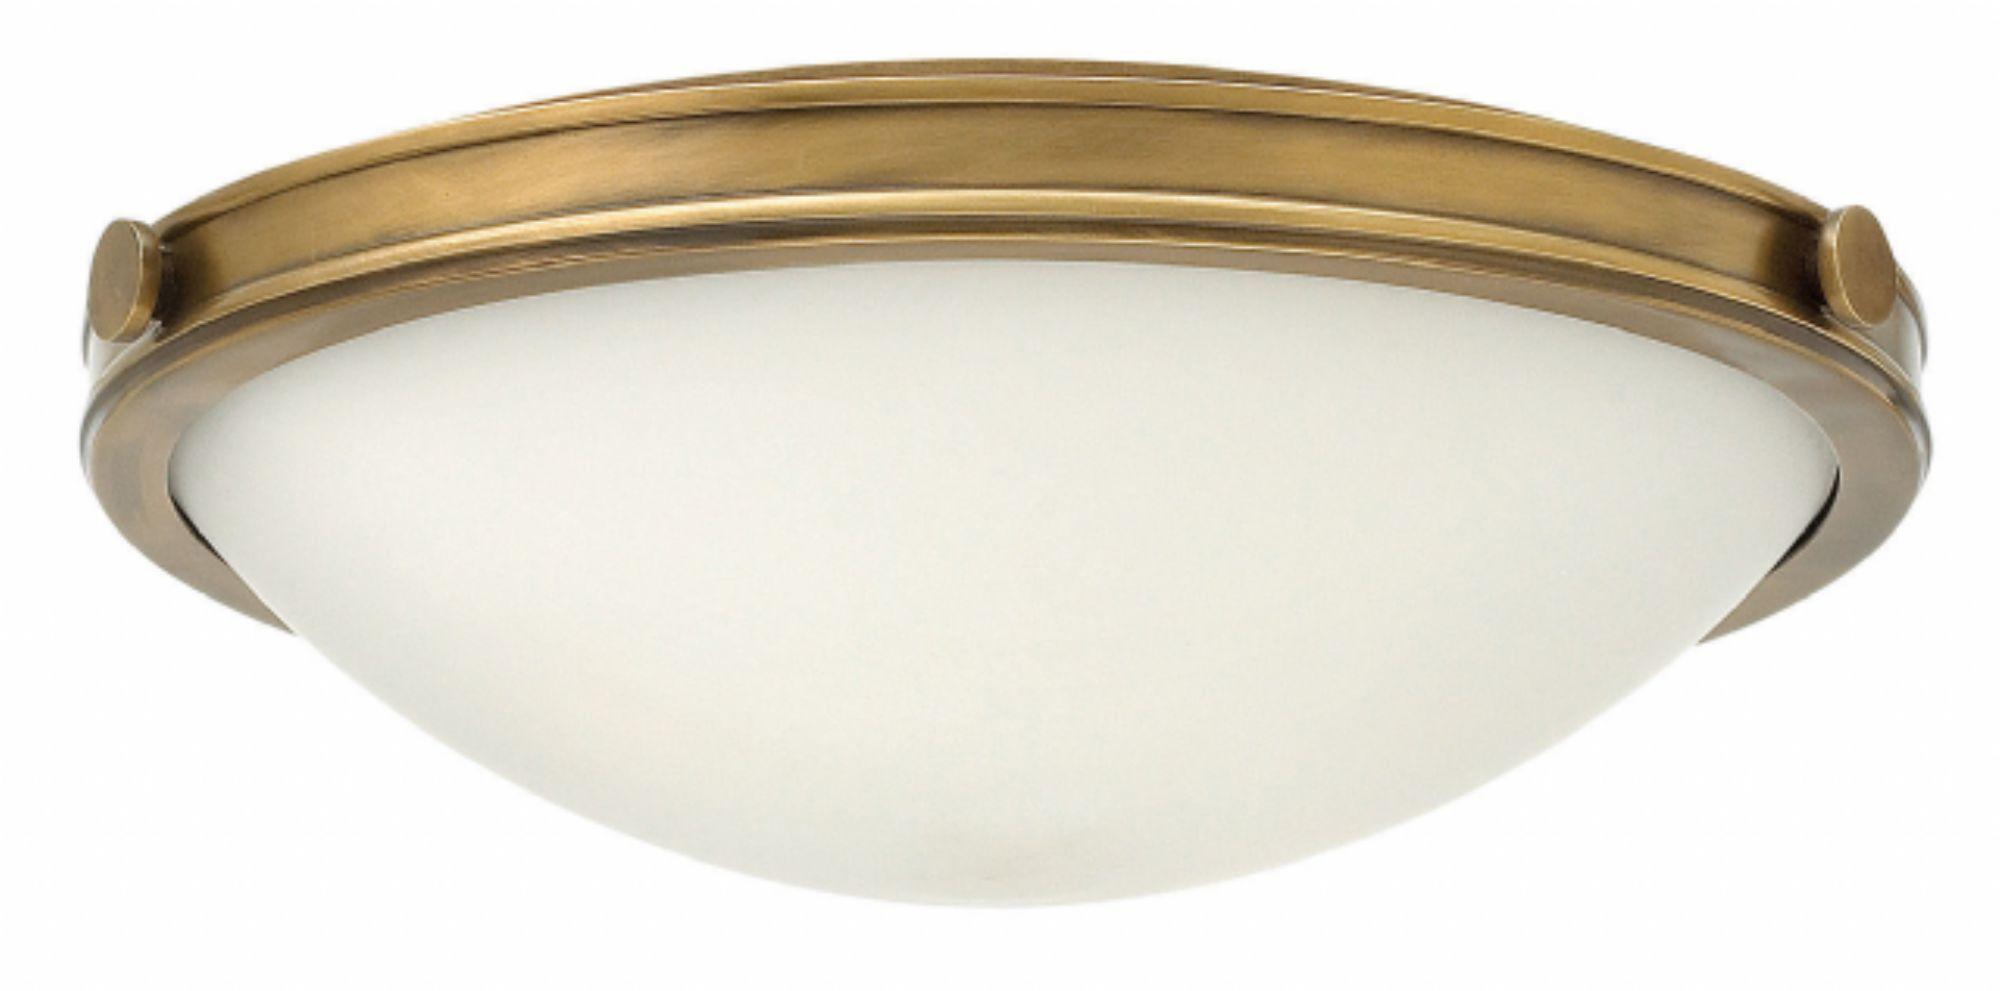 Hinkley Lighting   Maxwell 3783HB